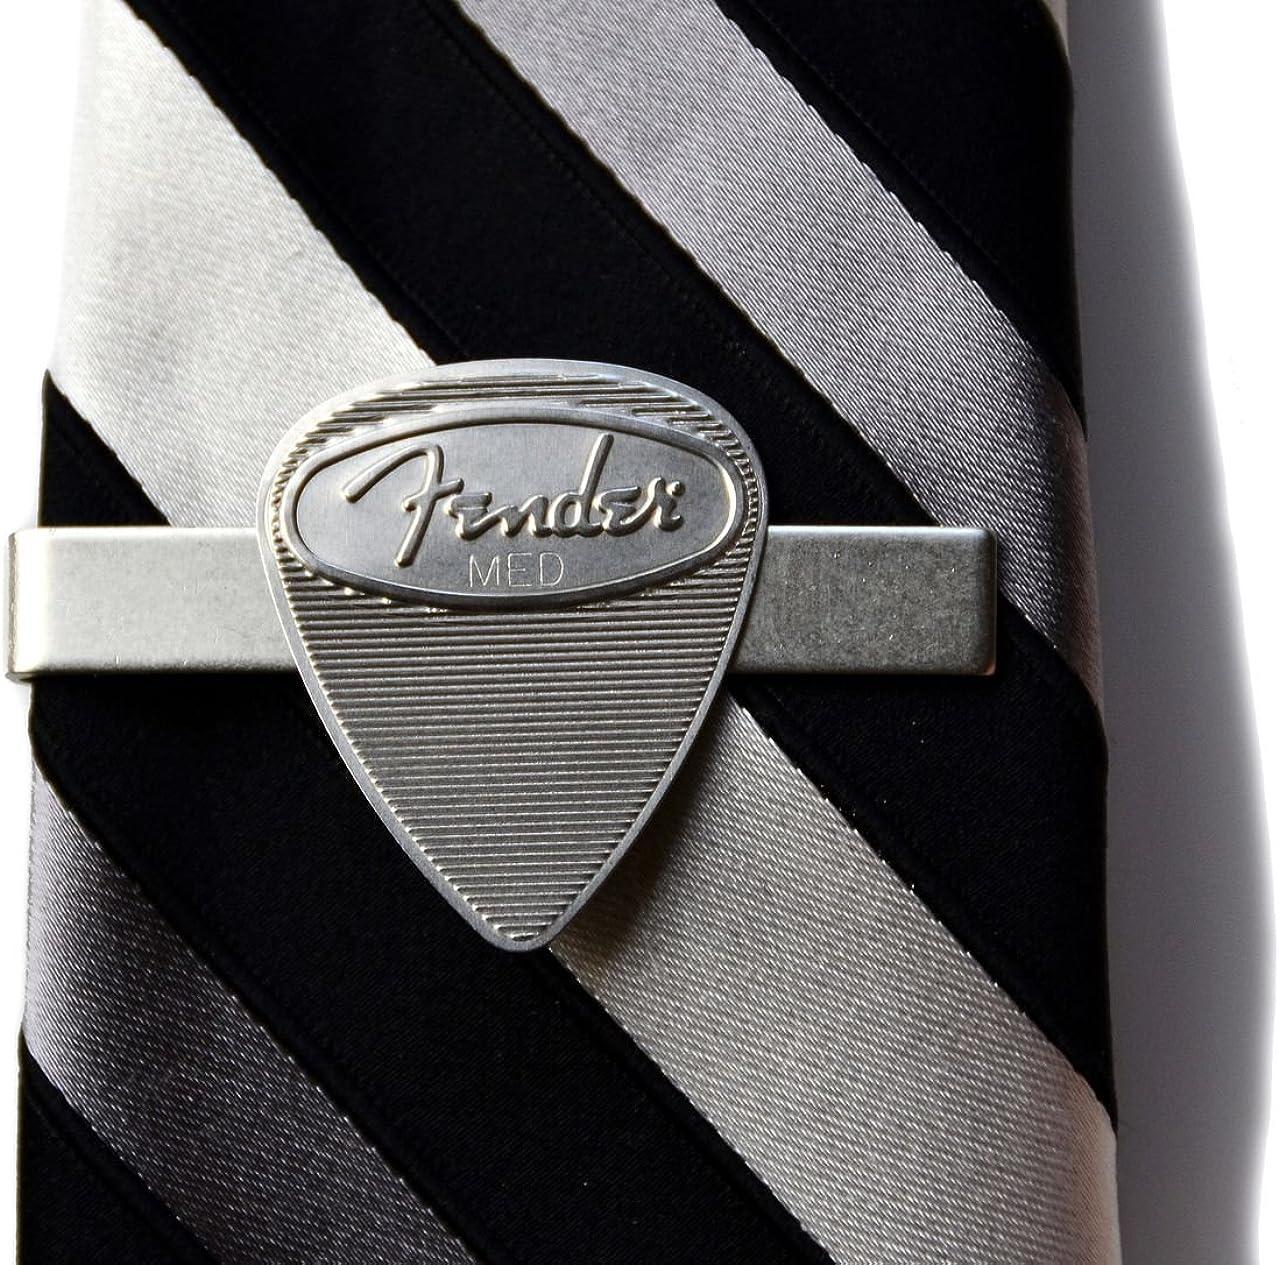 Quality Handcrafts Guaranteed Guitar Pick Tie Clip